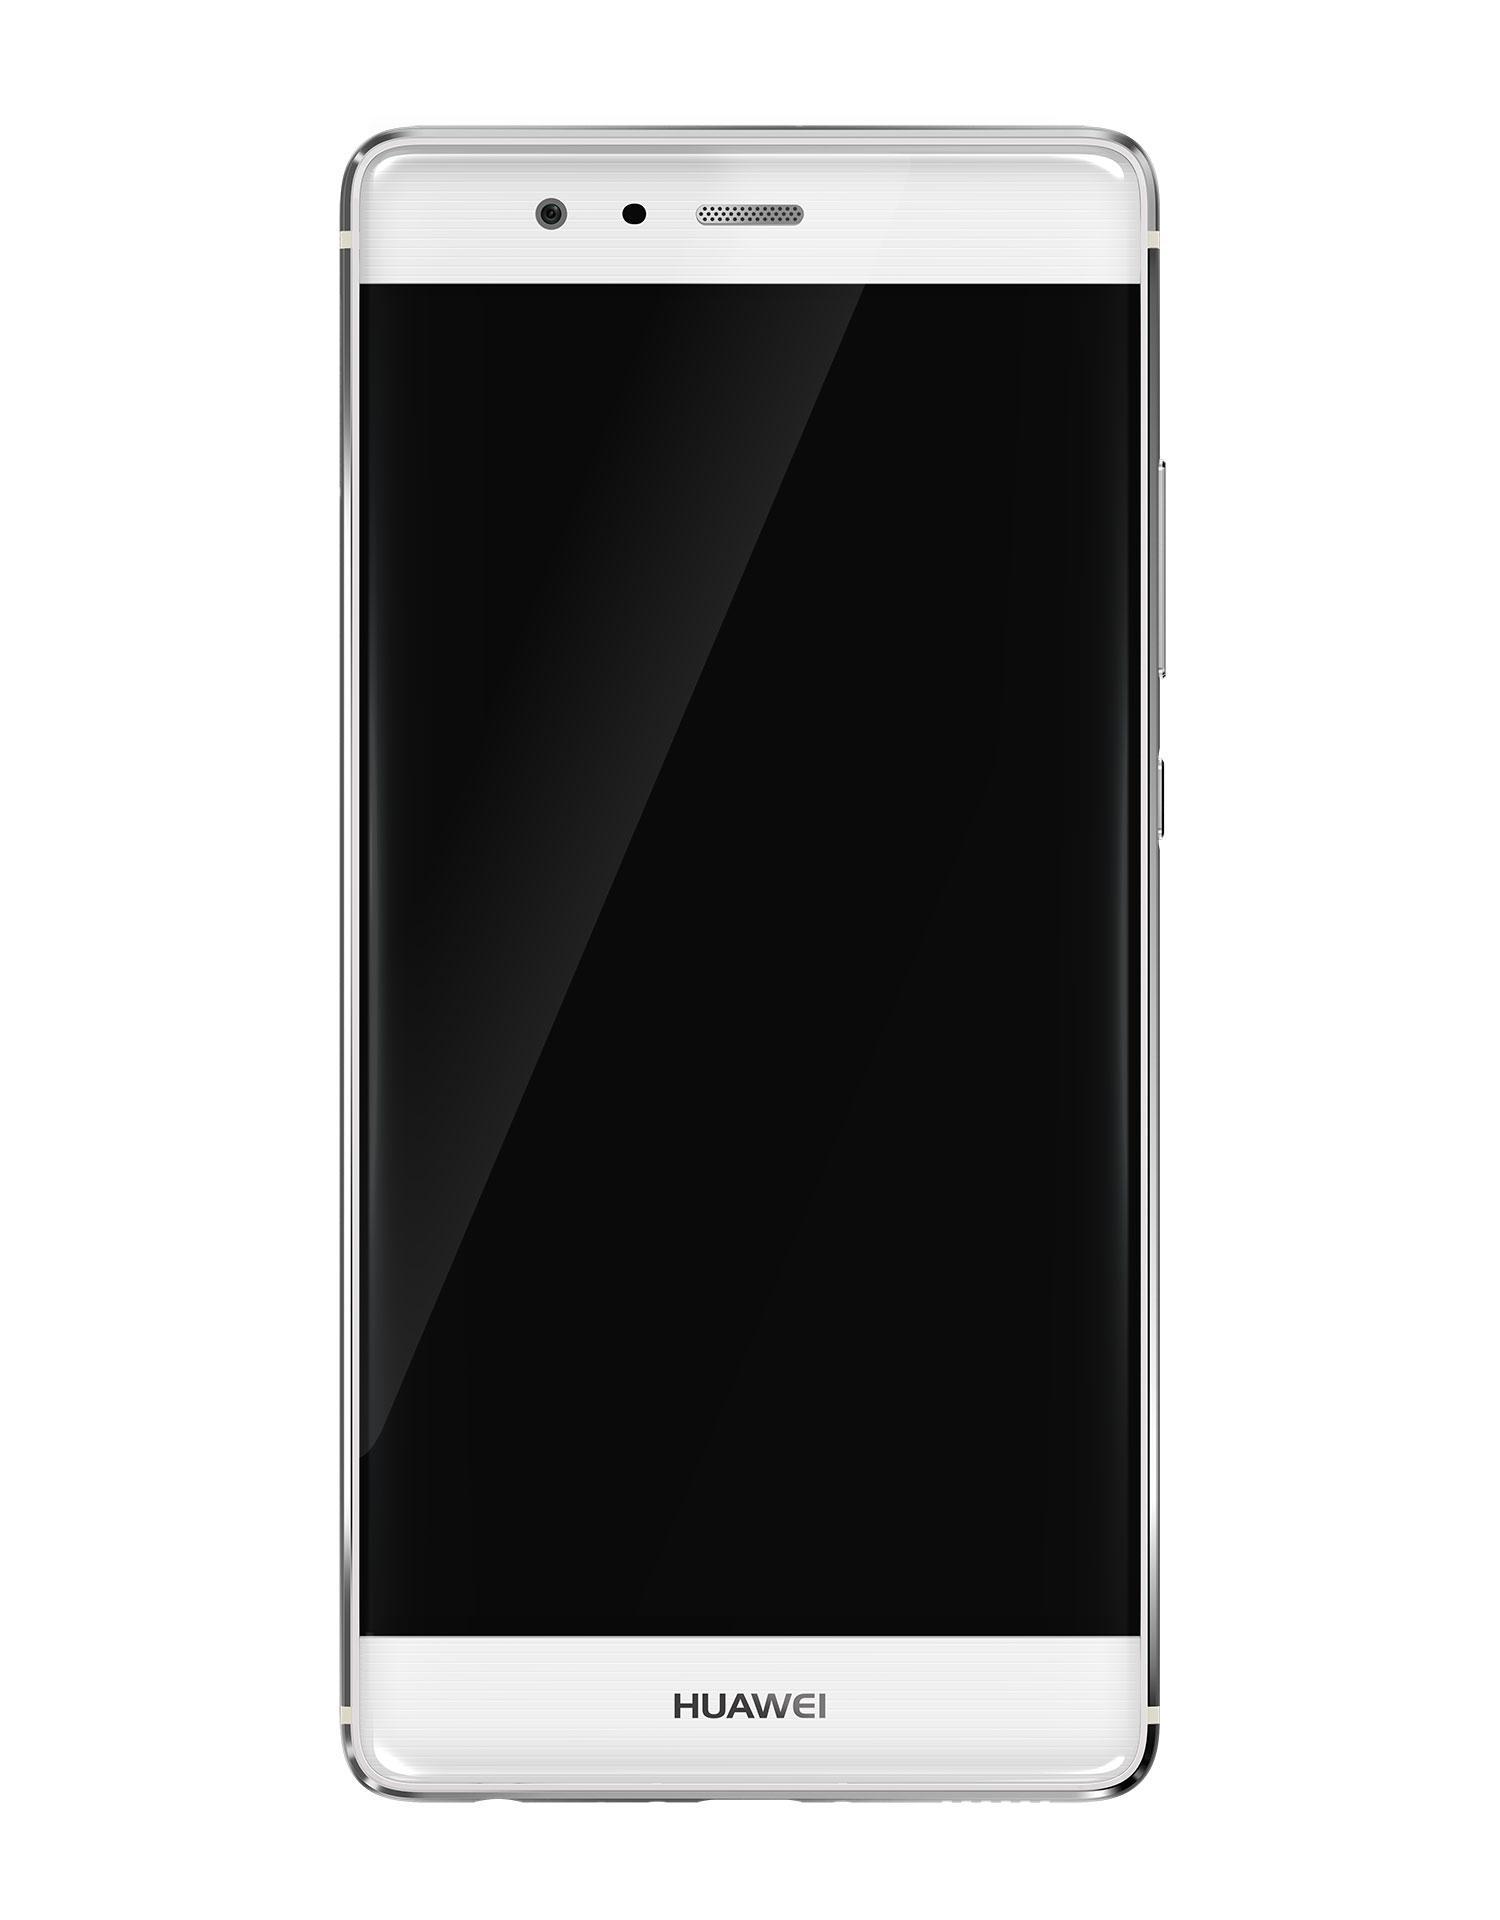 Huawei P9 blanco